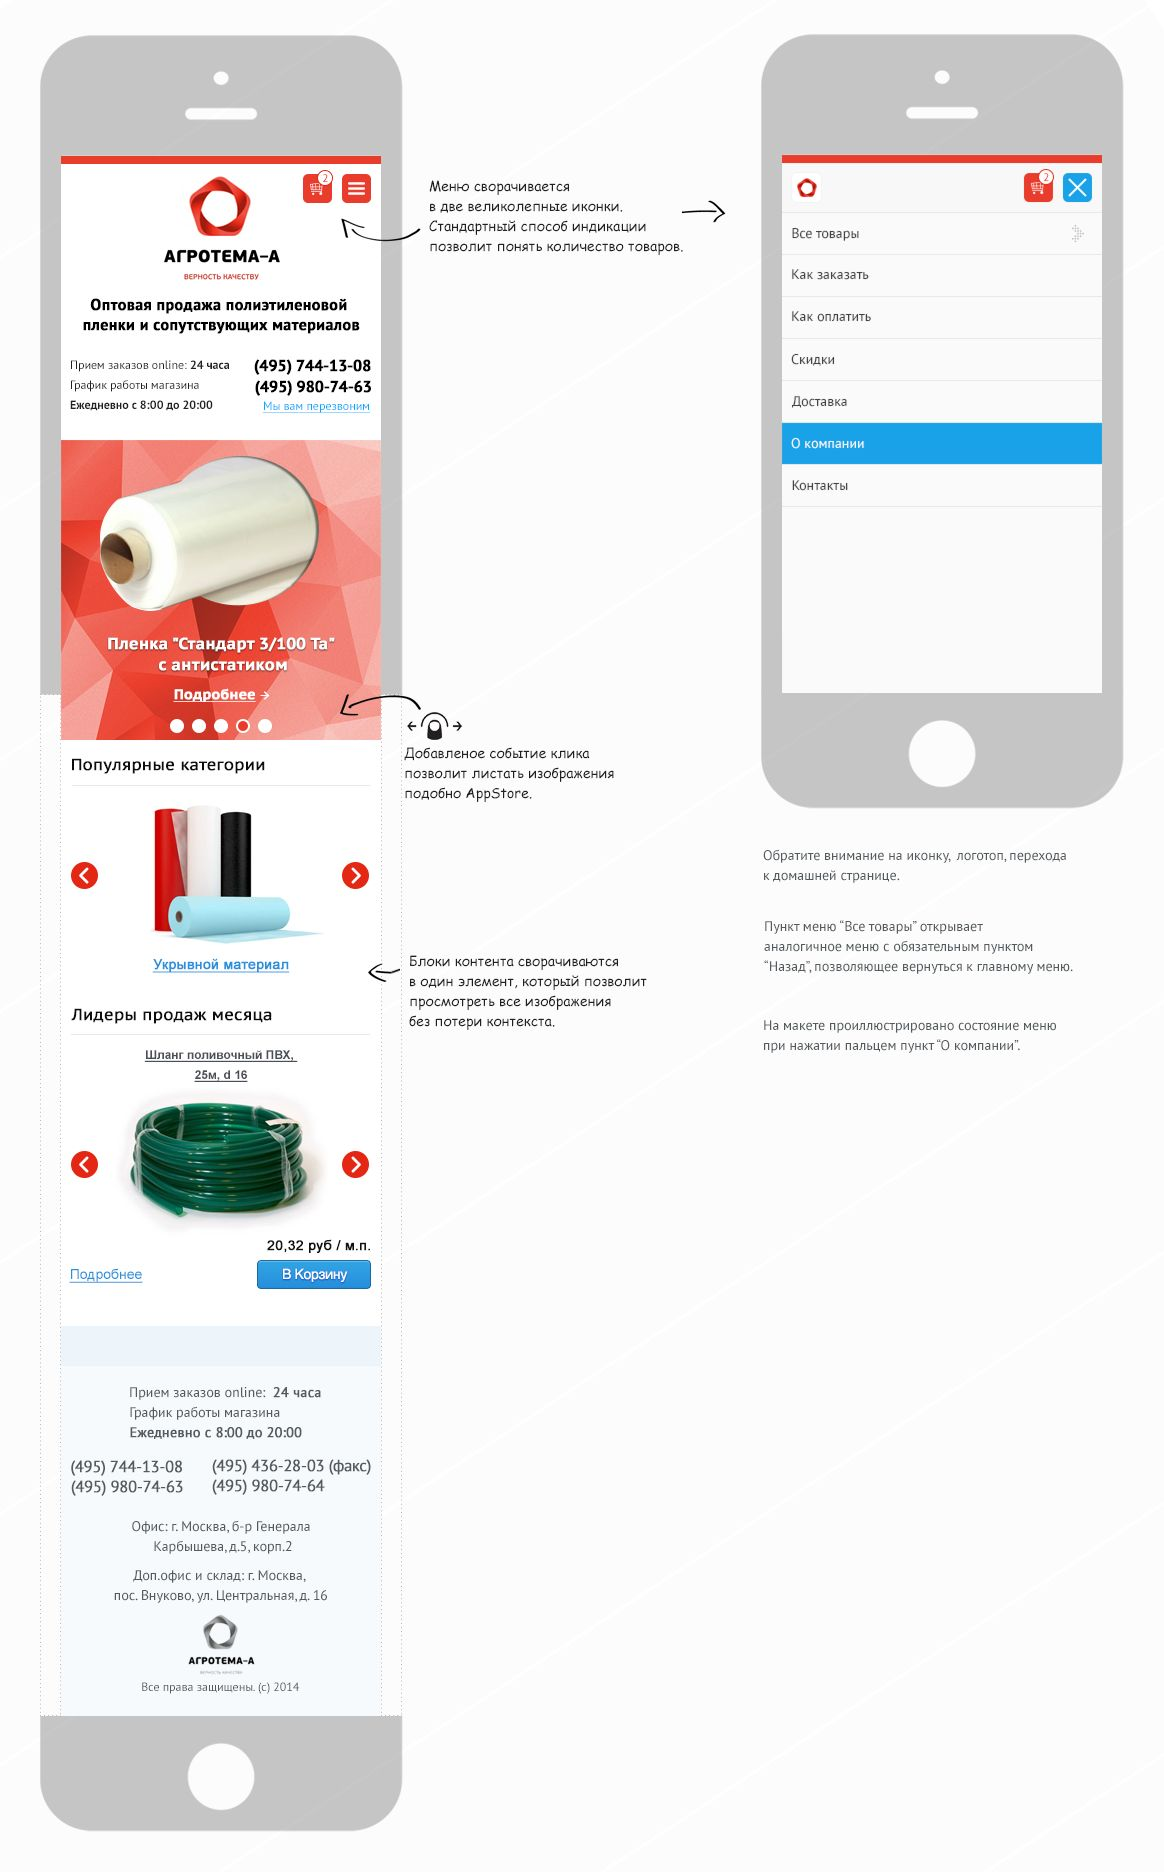 Новая главная страница agrotema.ru - дизайнер NickOtstavnov